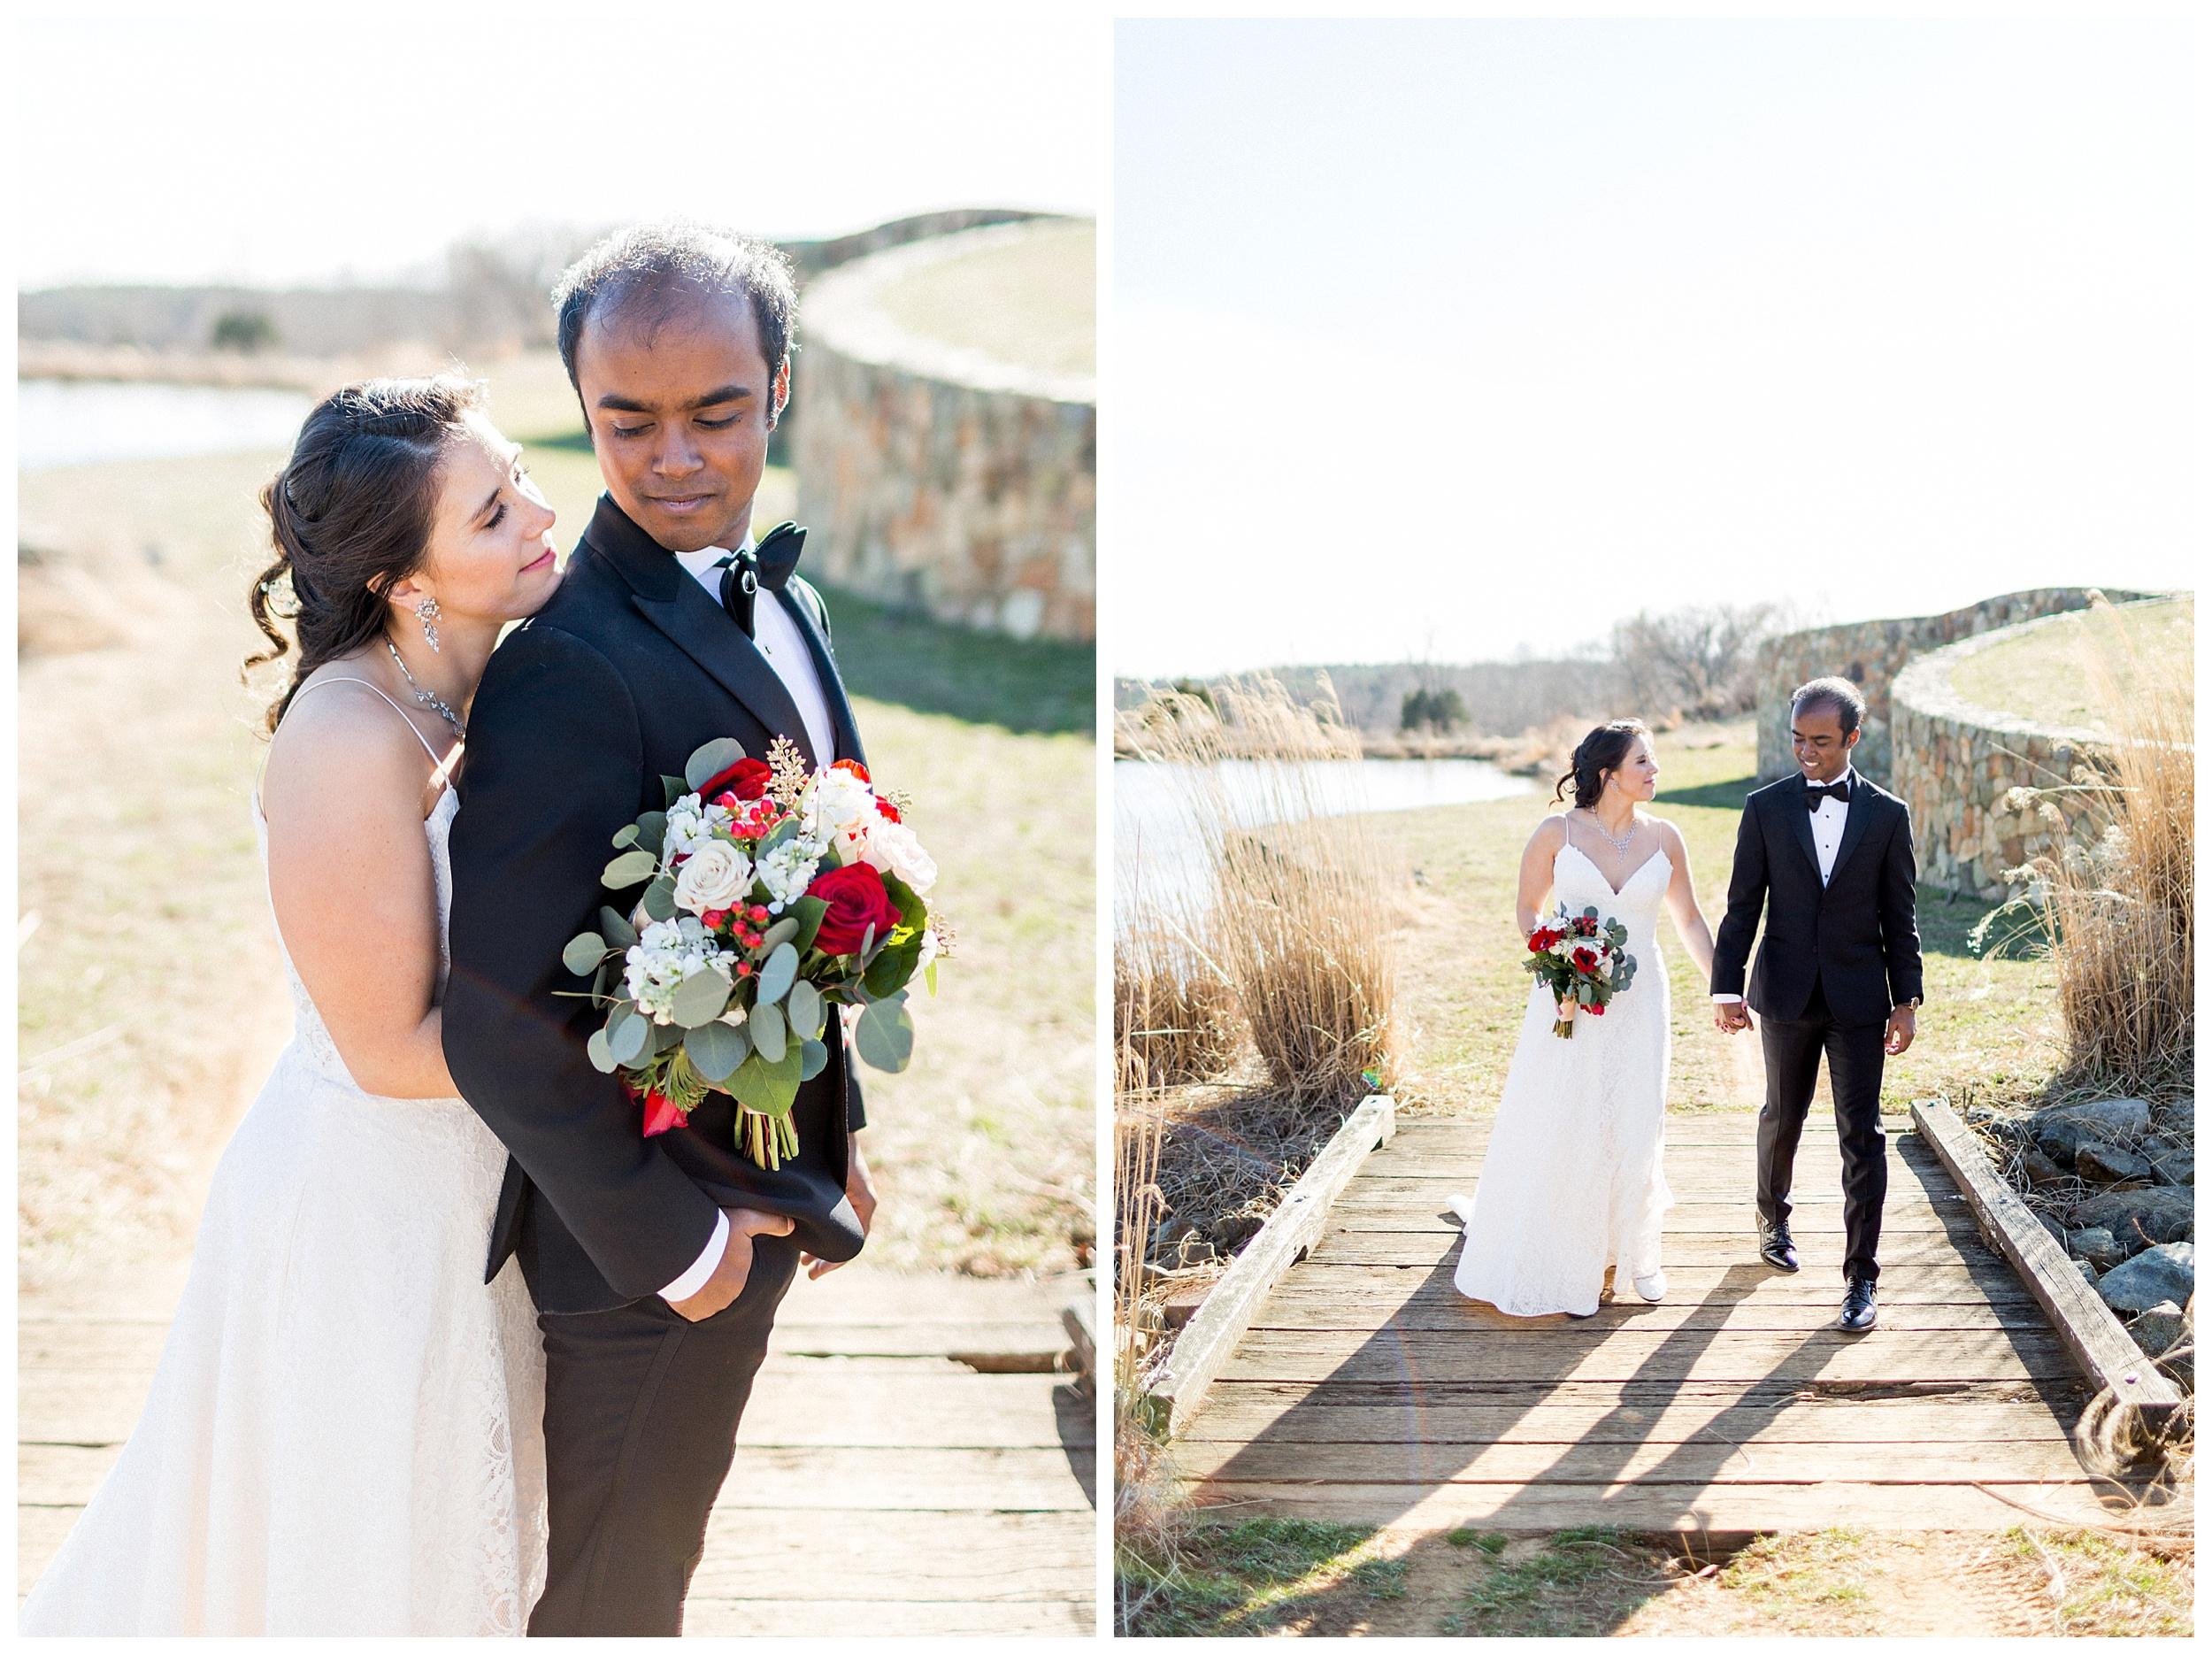 Stone Tower Winery Wedding | Virginia Winter Wedding | VA Wedding Photographer Kir Tuben_0046.jpg